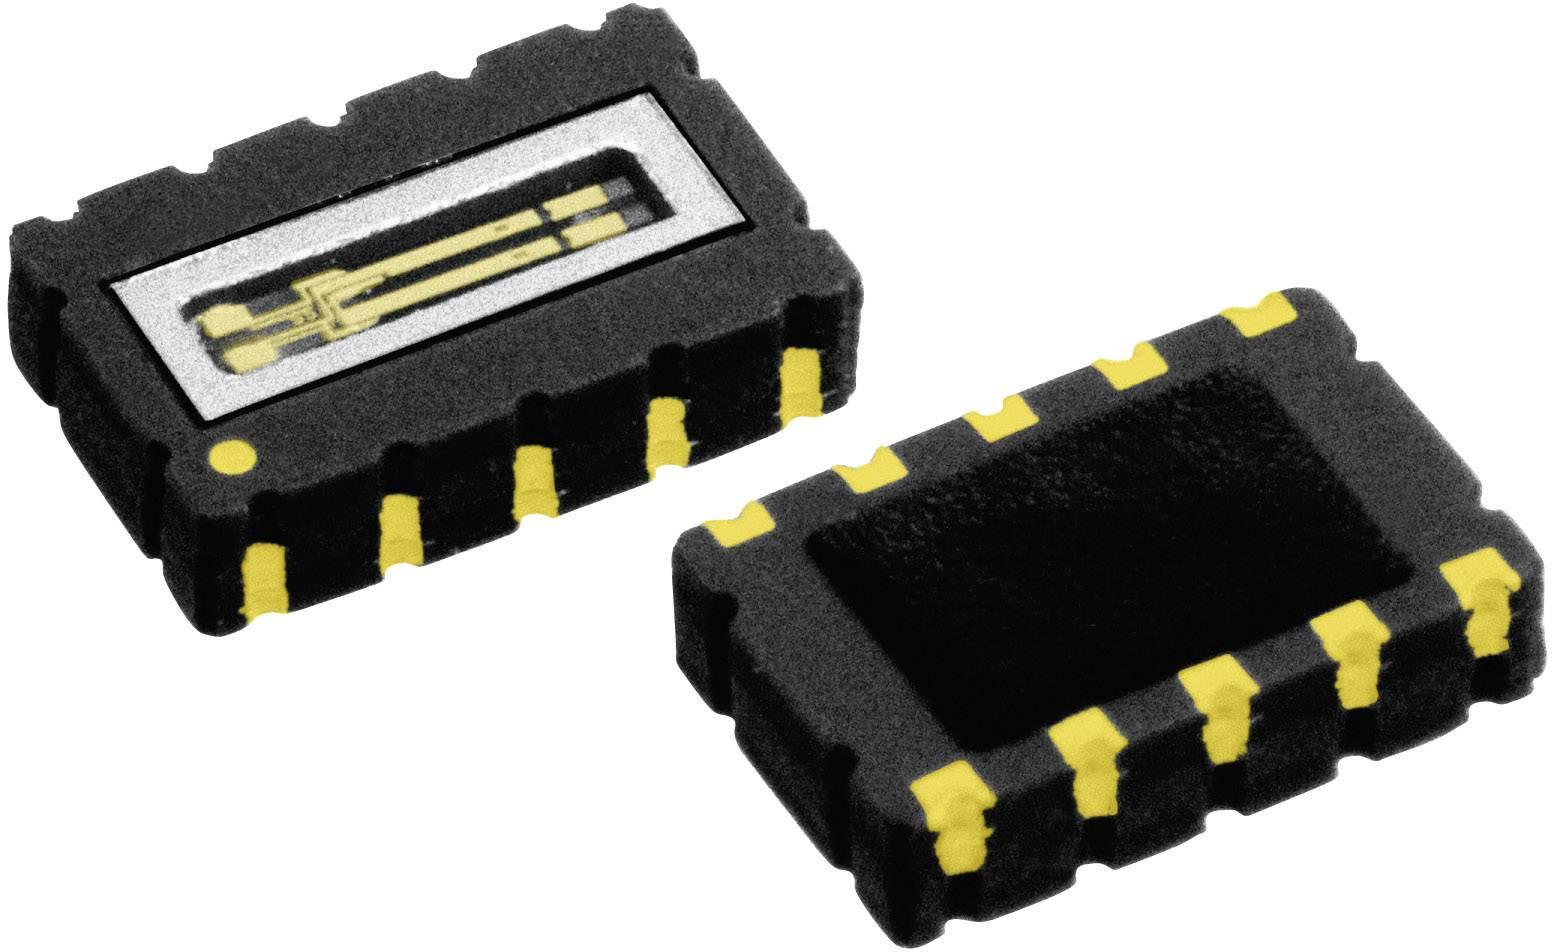 SMD krystal MicroCrystal, RV-3029-C2-TA Option B